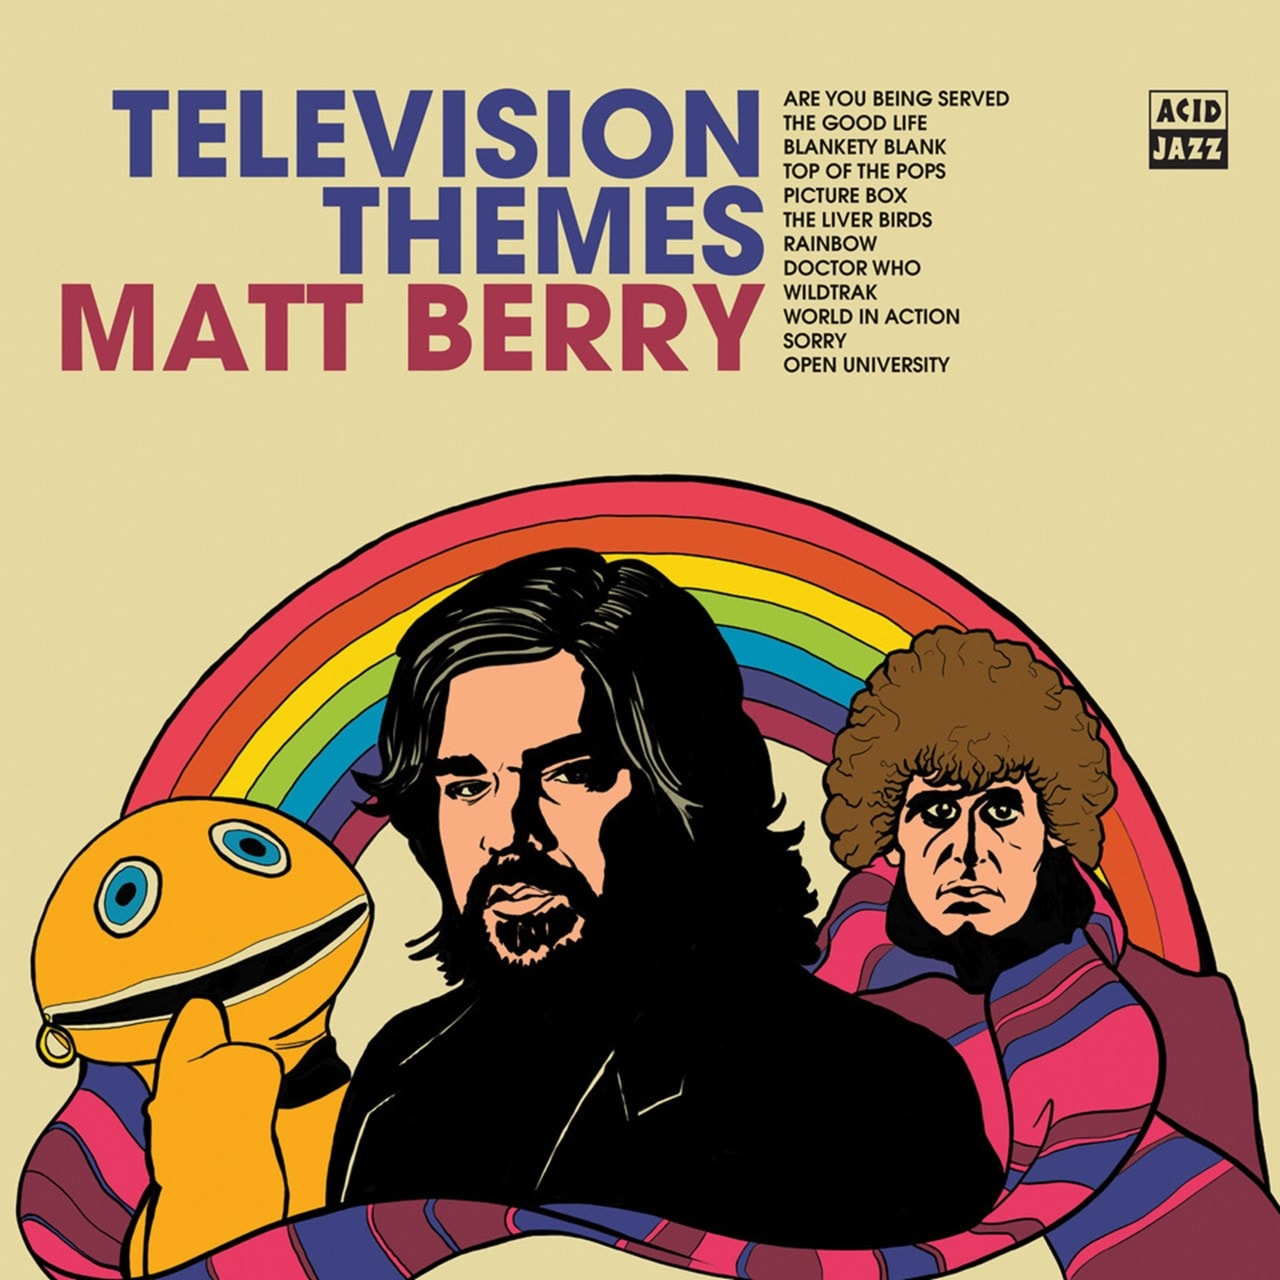 Television Themes - 1